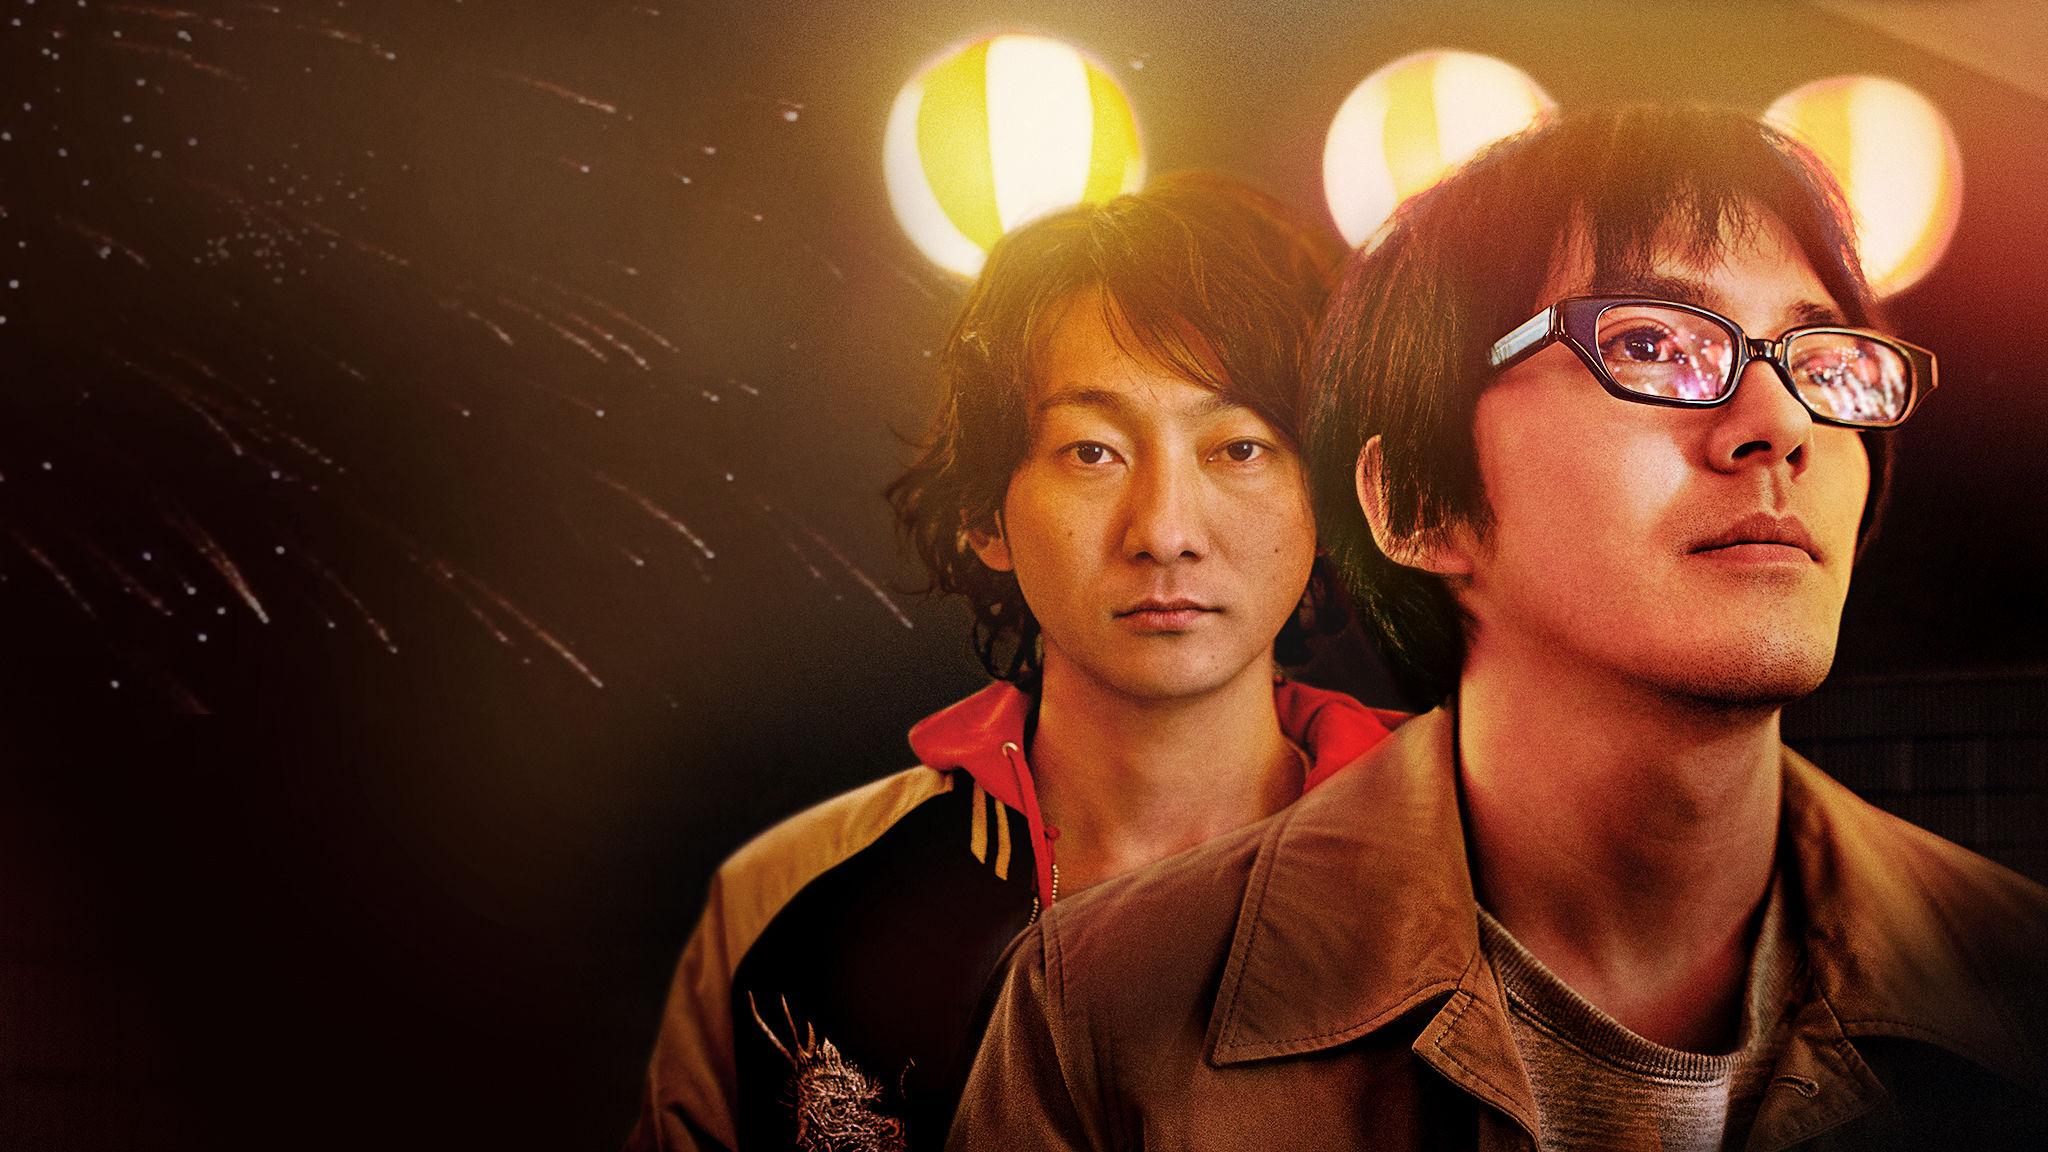 Hibana (Spark) Netflix review